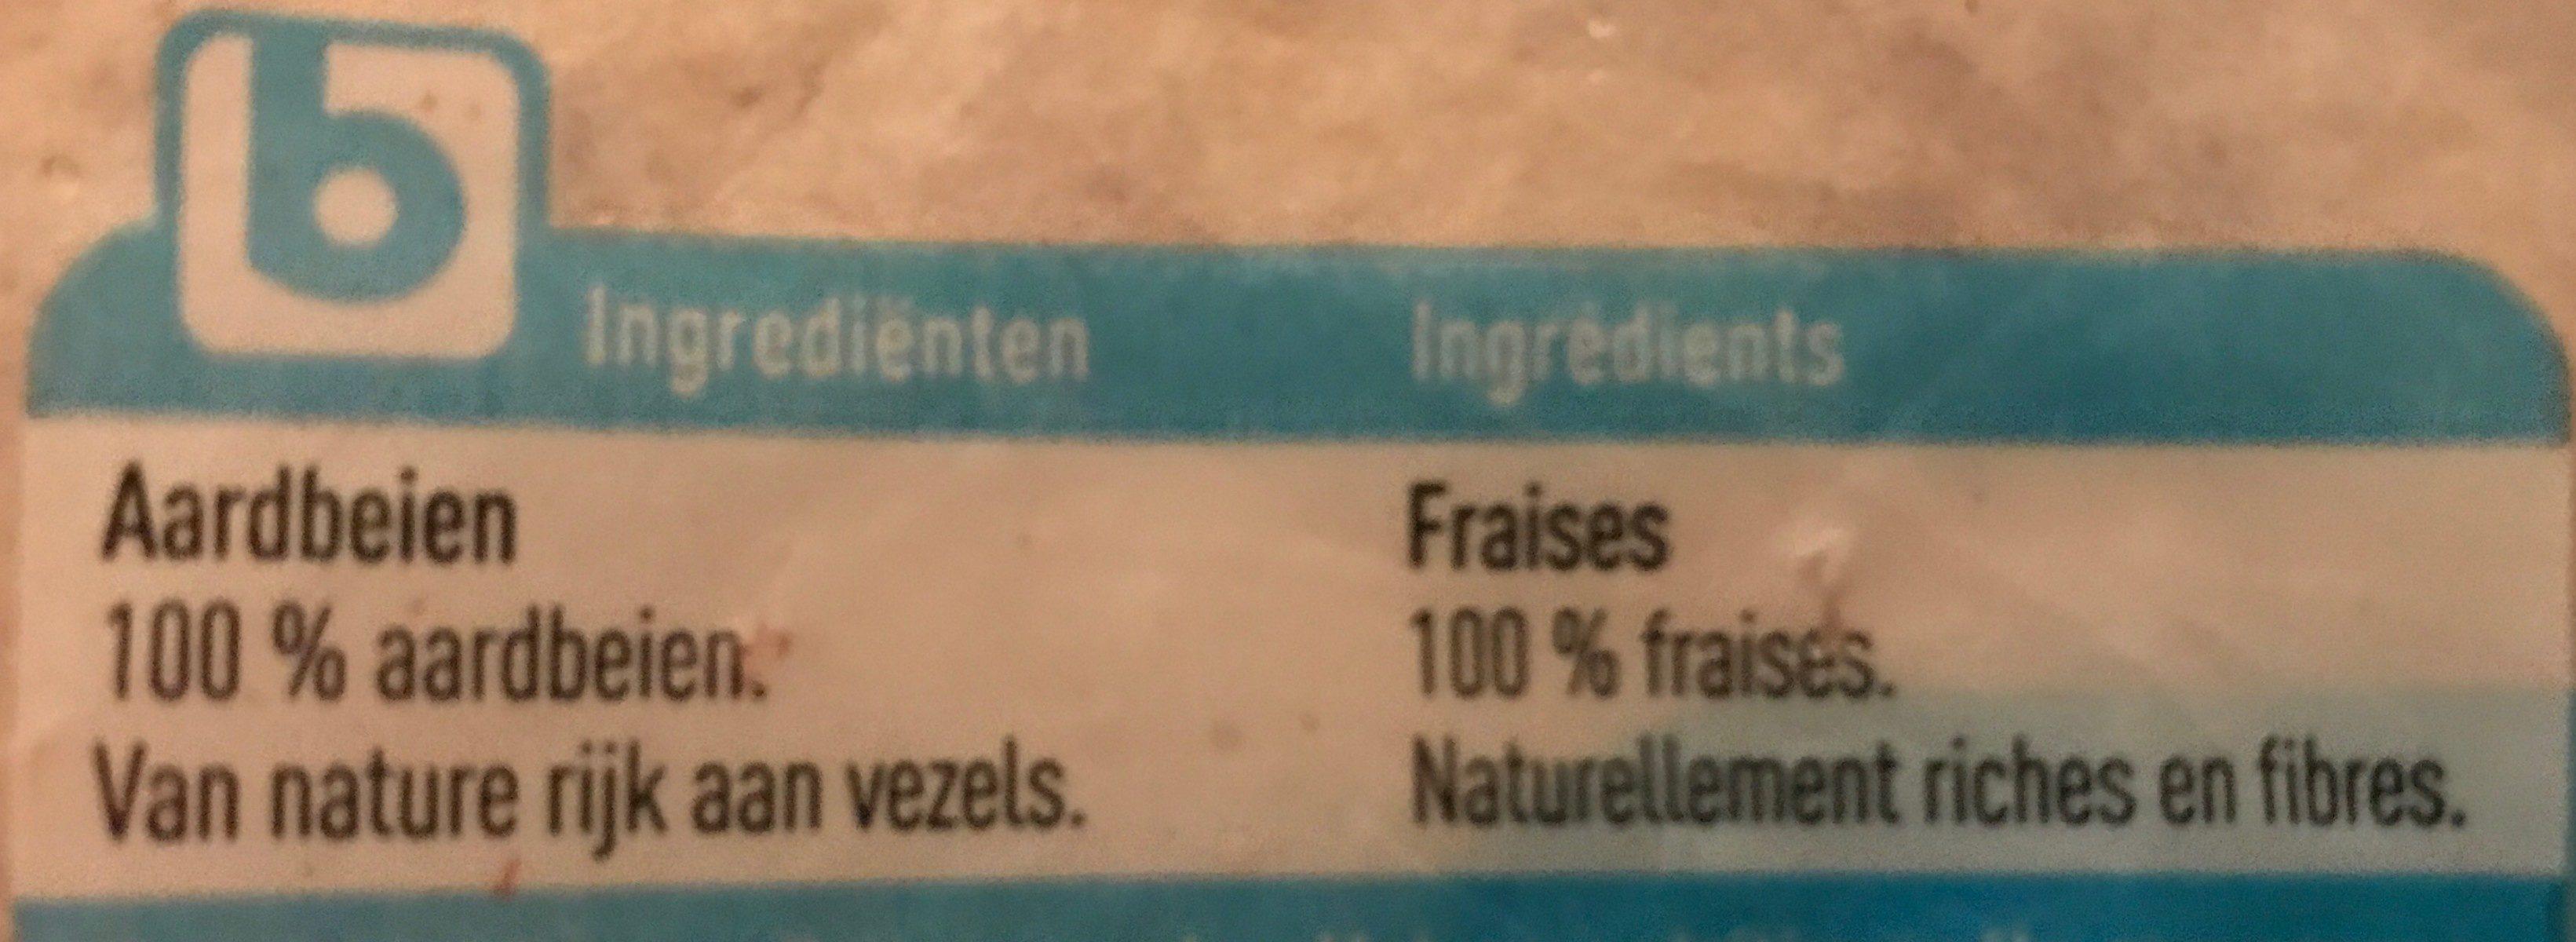 Fraises surgelées - Ingrediënten